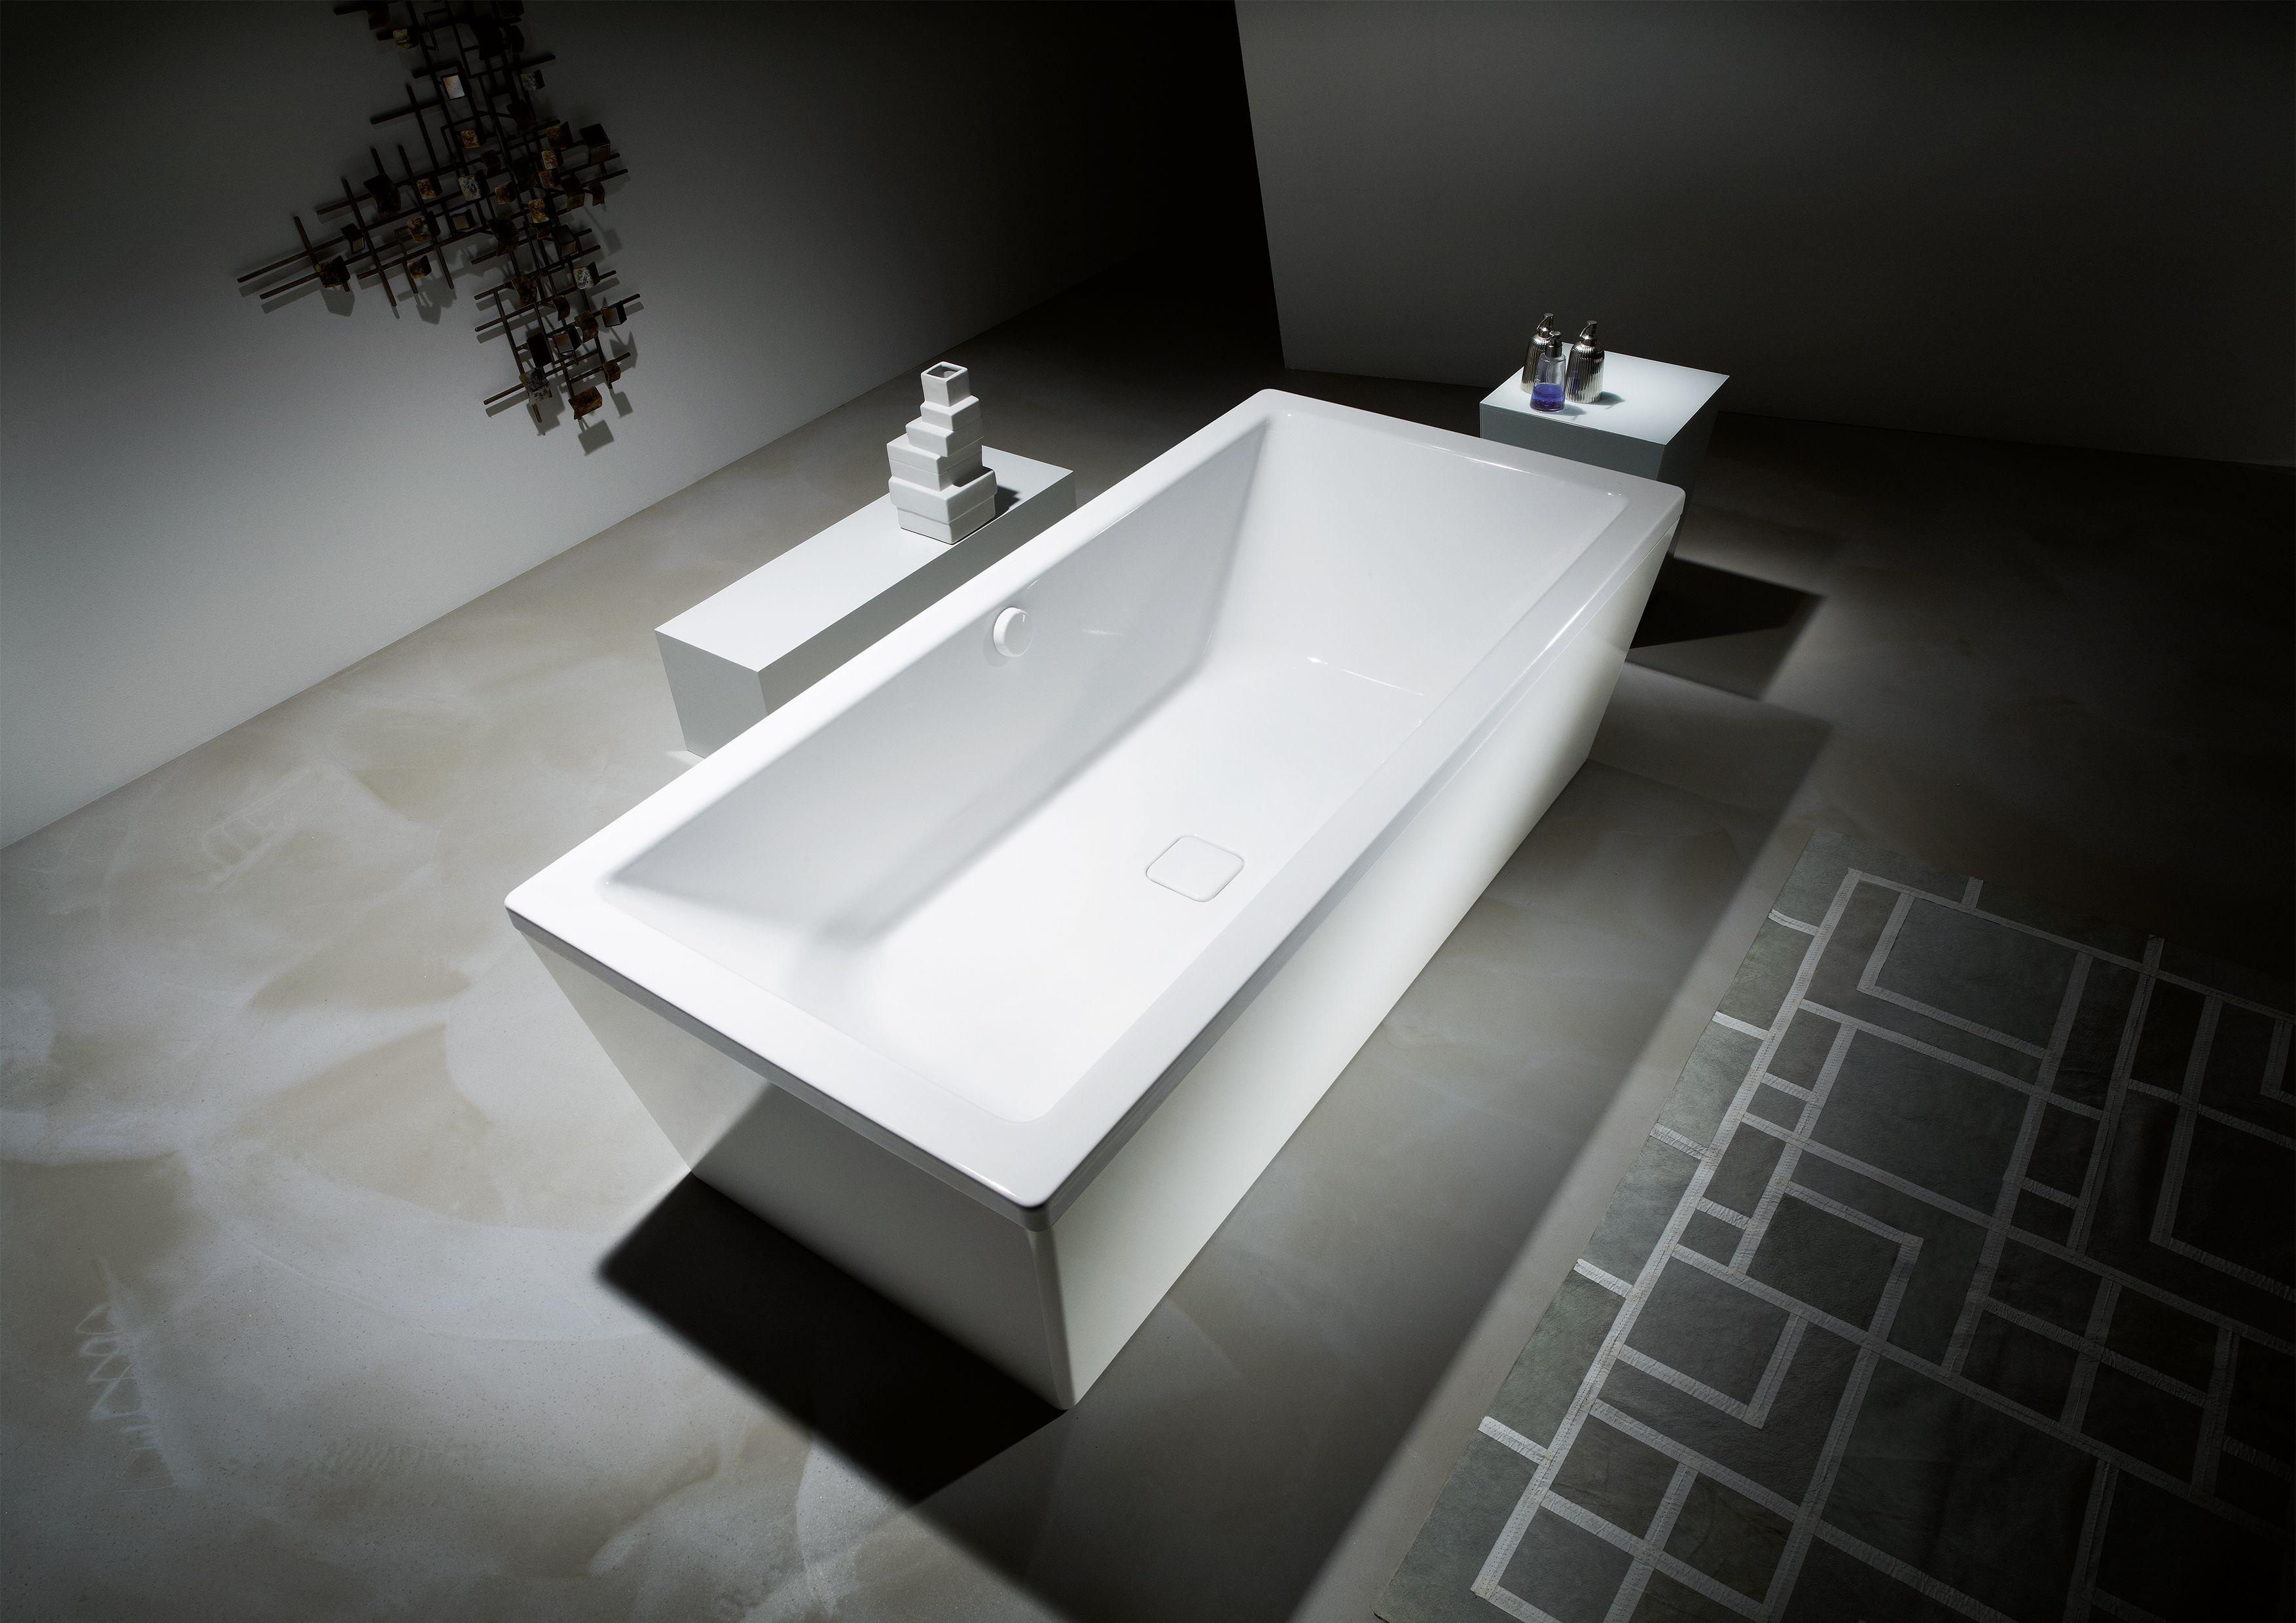 Image Result For Kaldewei Sottsass Bathtub Kaldewei Badewanne Badewanne Bad Design